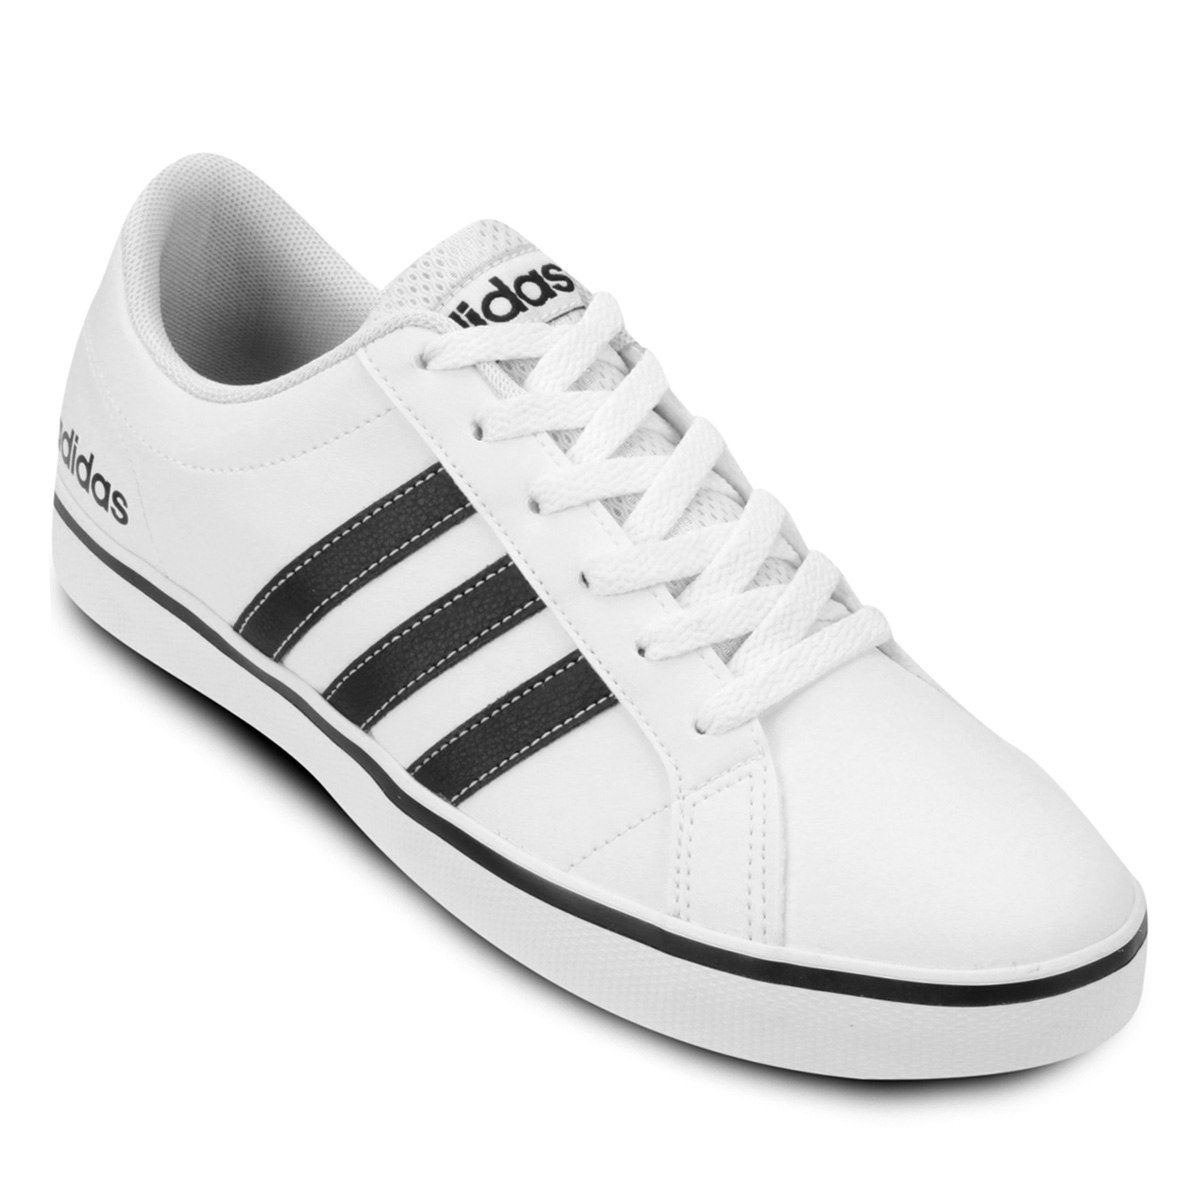 Tênis Adidas Pace Vs Masculino Branco e Preto